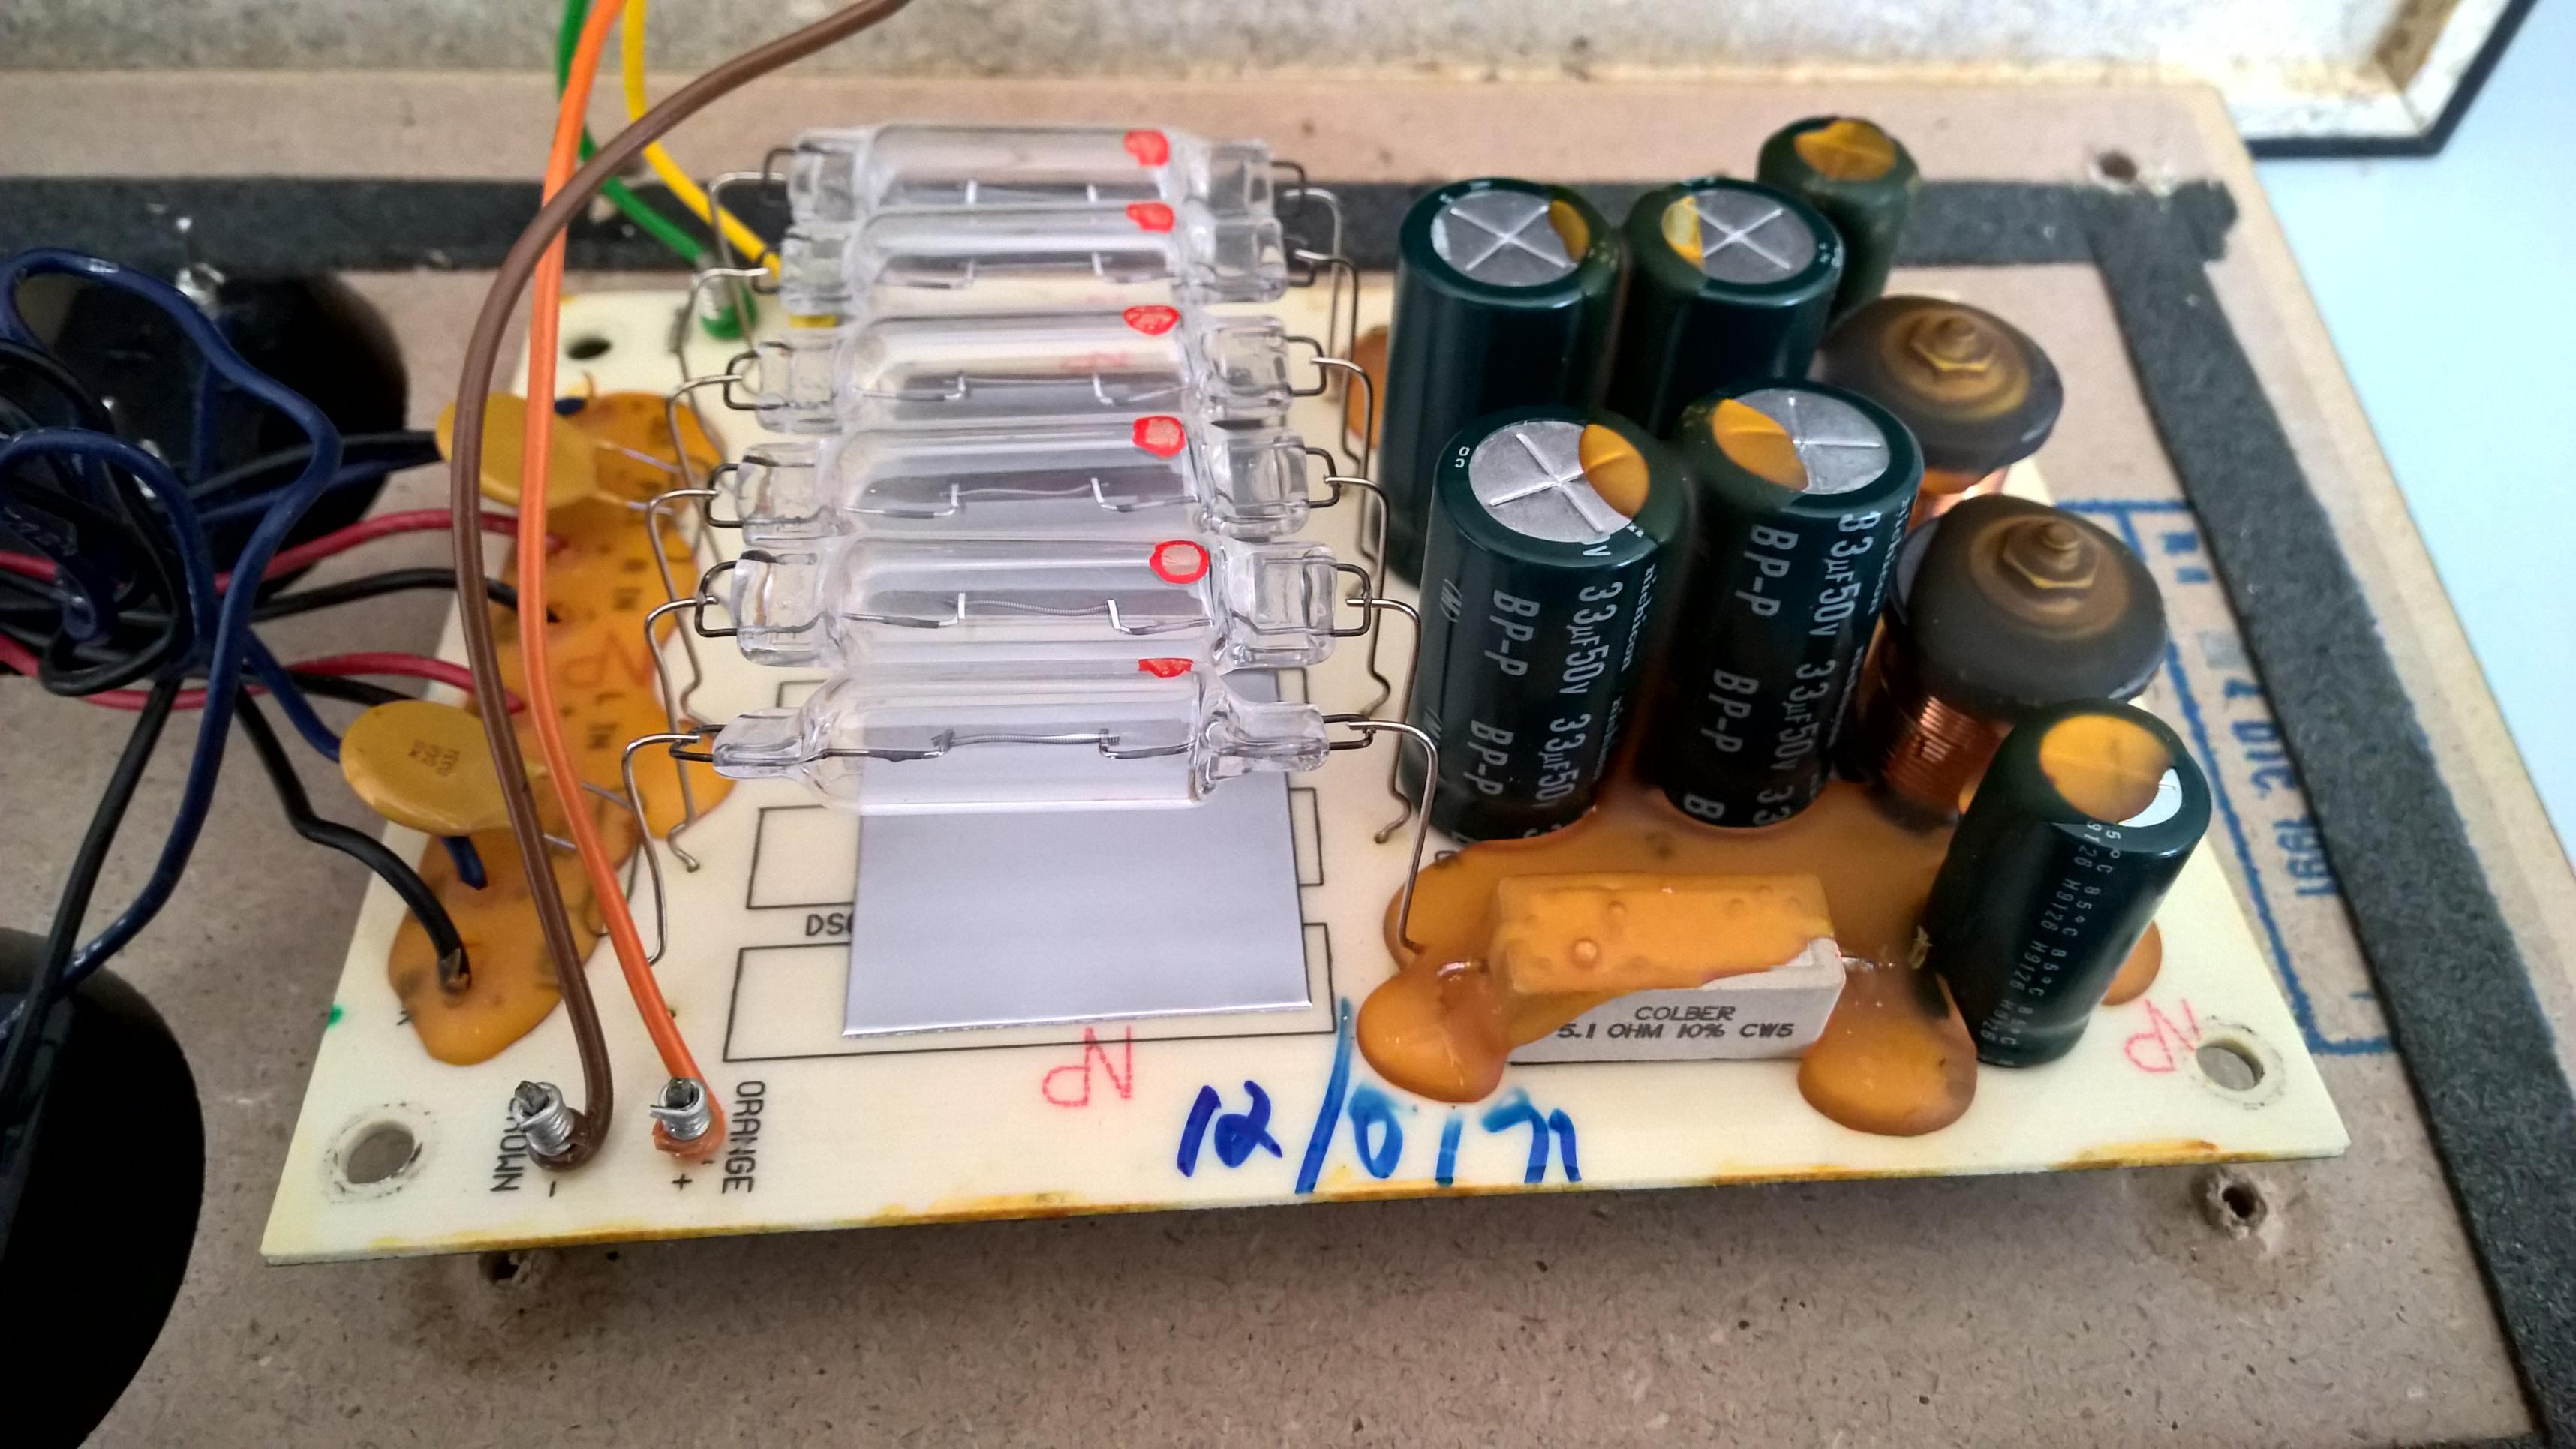 Bose Acoustimass 5 kein Bass -> reparieren? - ComputerBase Forum